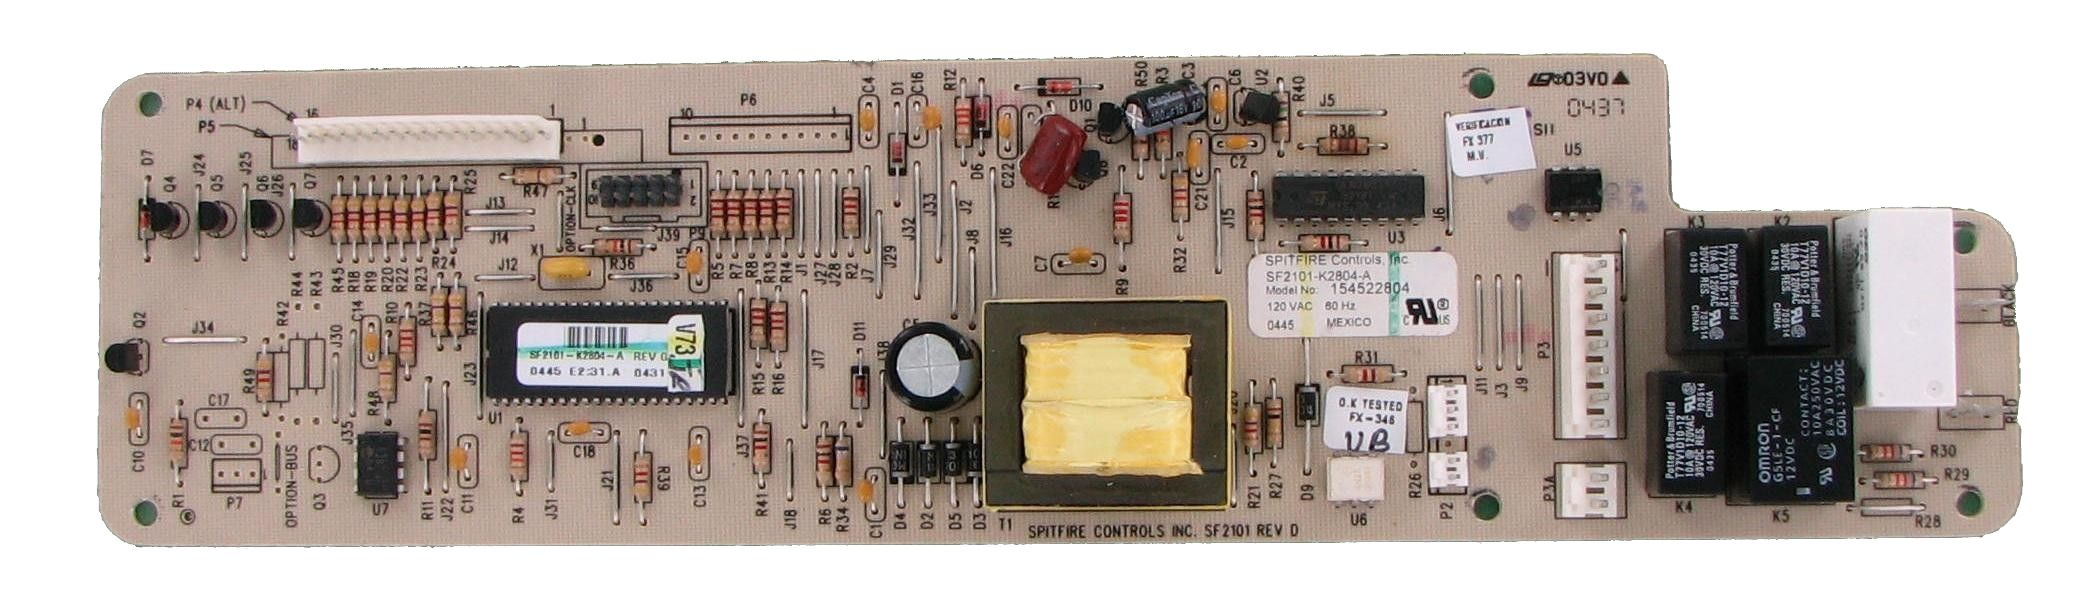 Frigidaire 154540104 Dishwasher Electronic Control Board Frigidaire Dishwasher Broken Appliance Frigidaire